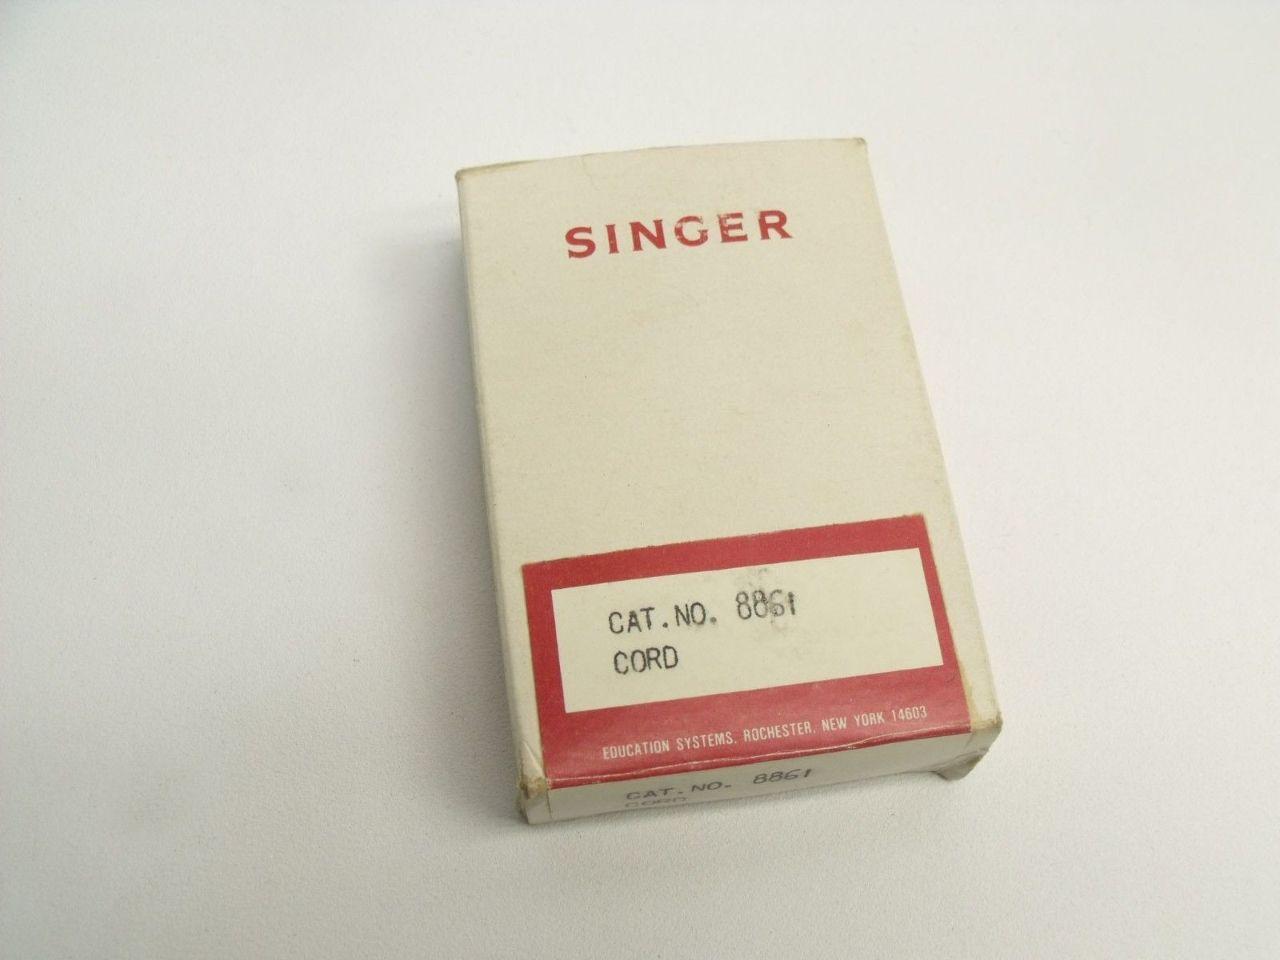 singer sewing machine cord